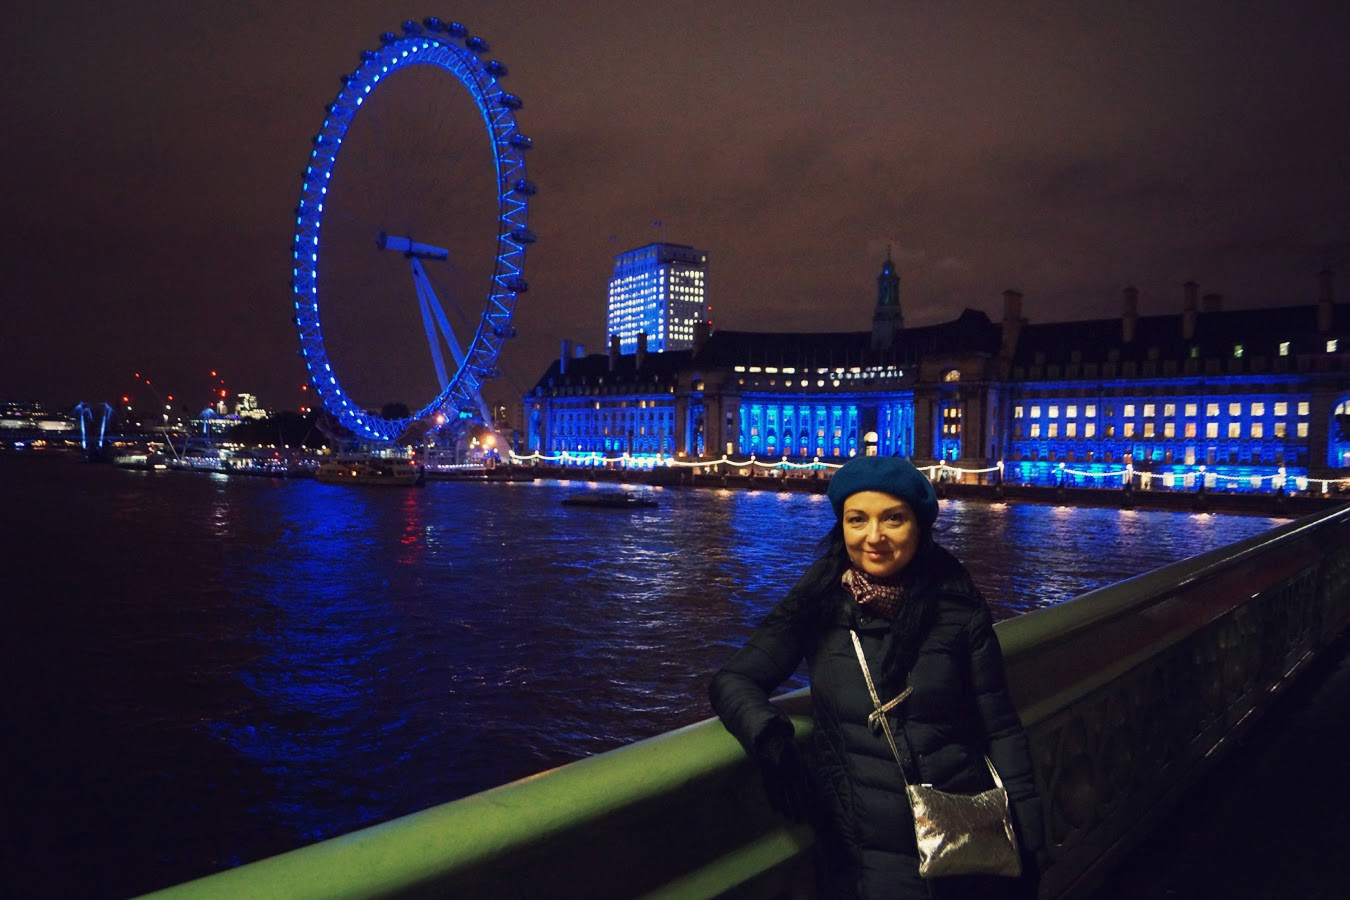 The+London+Eye